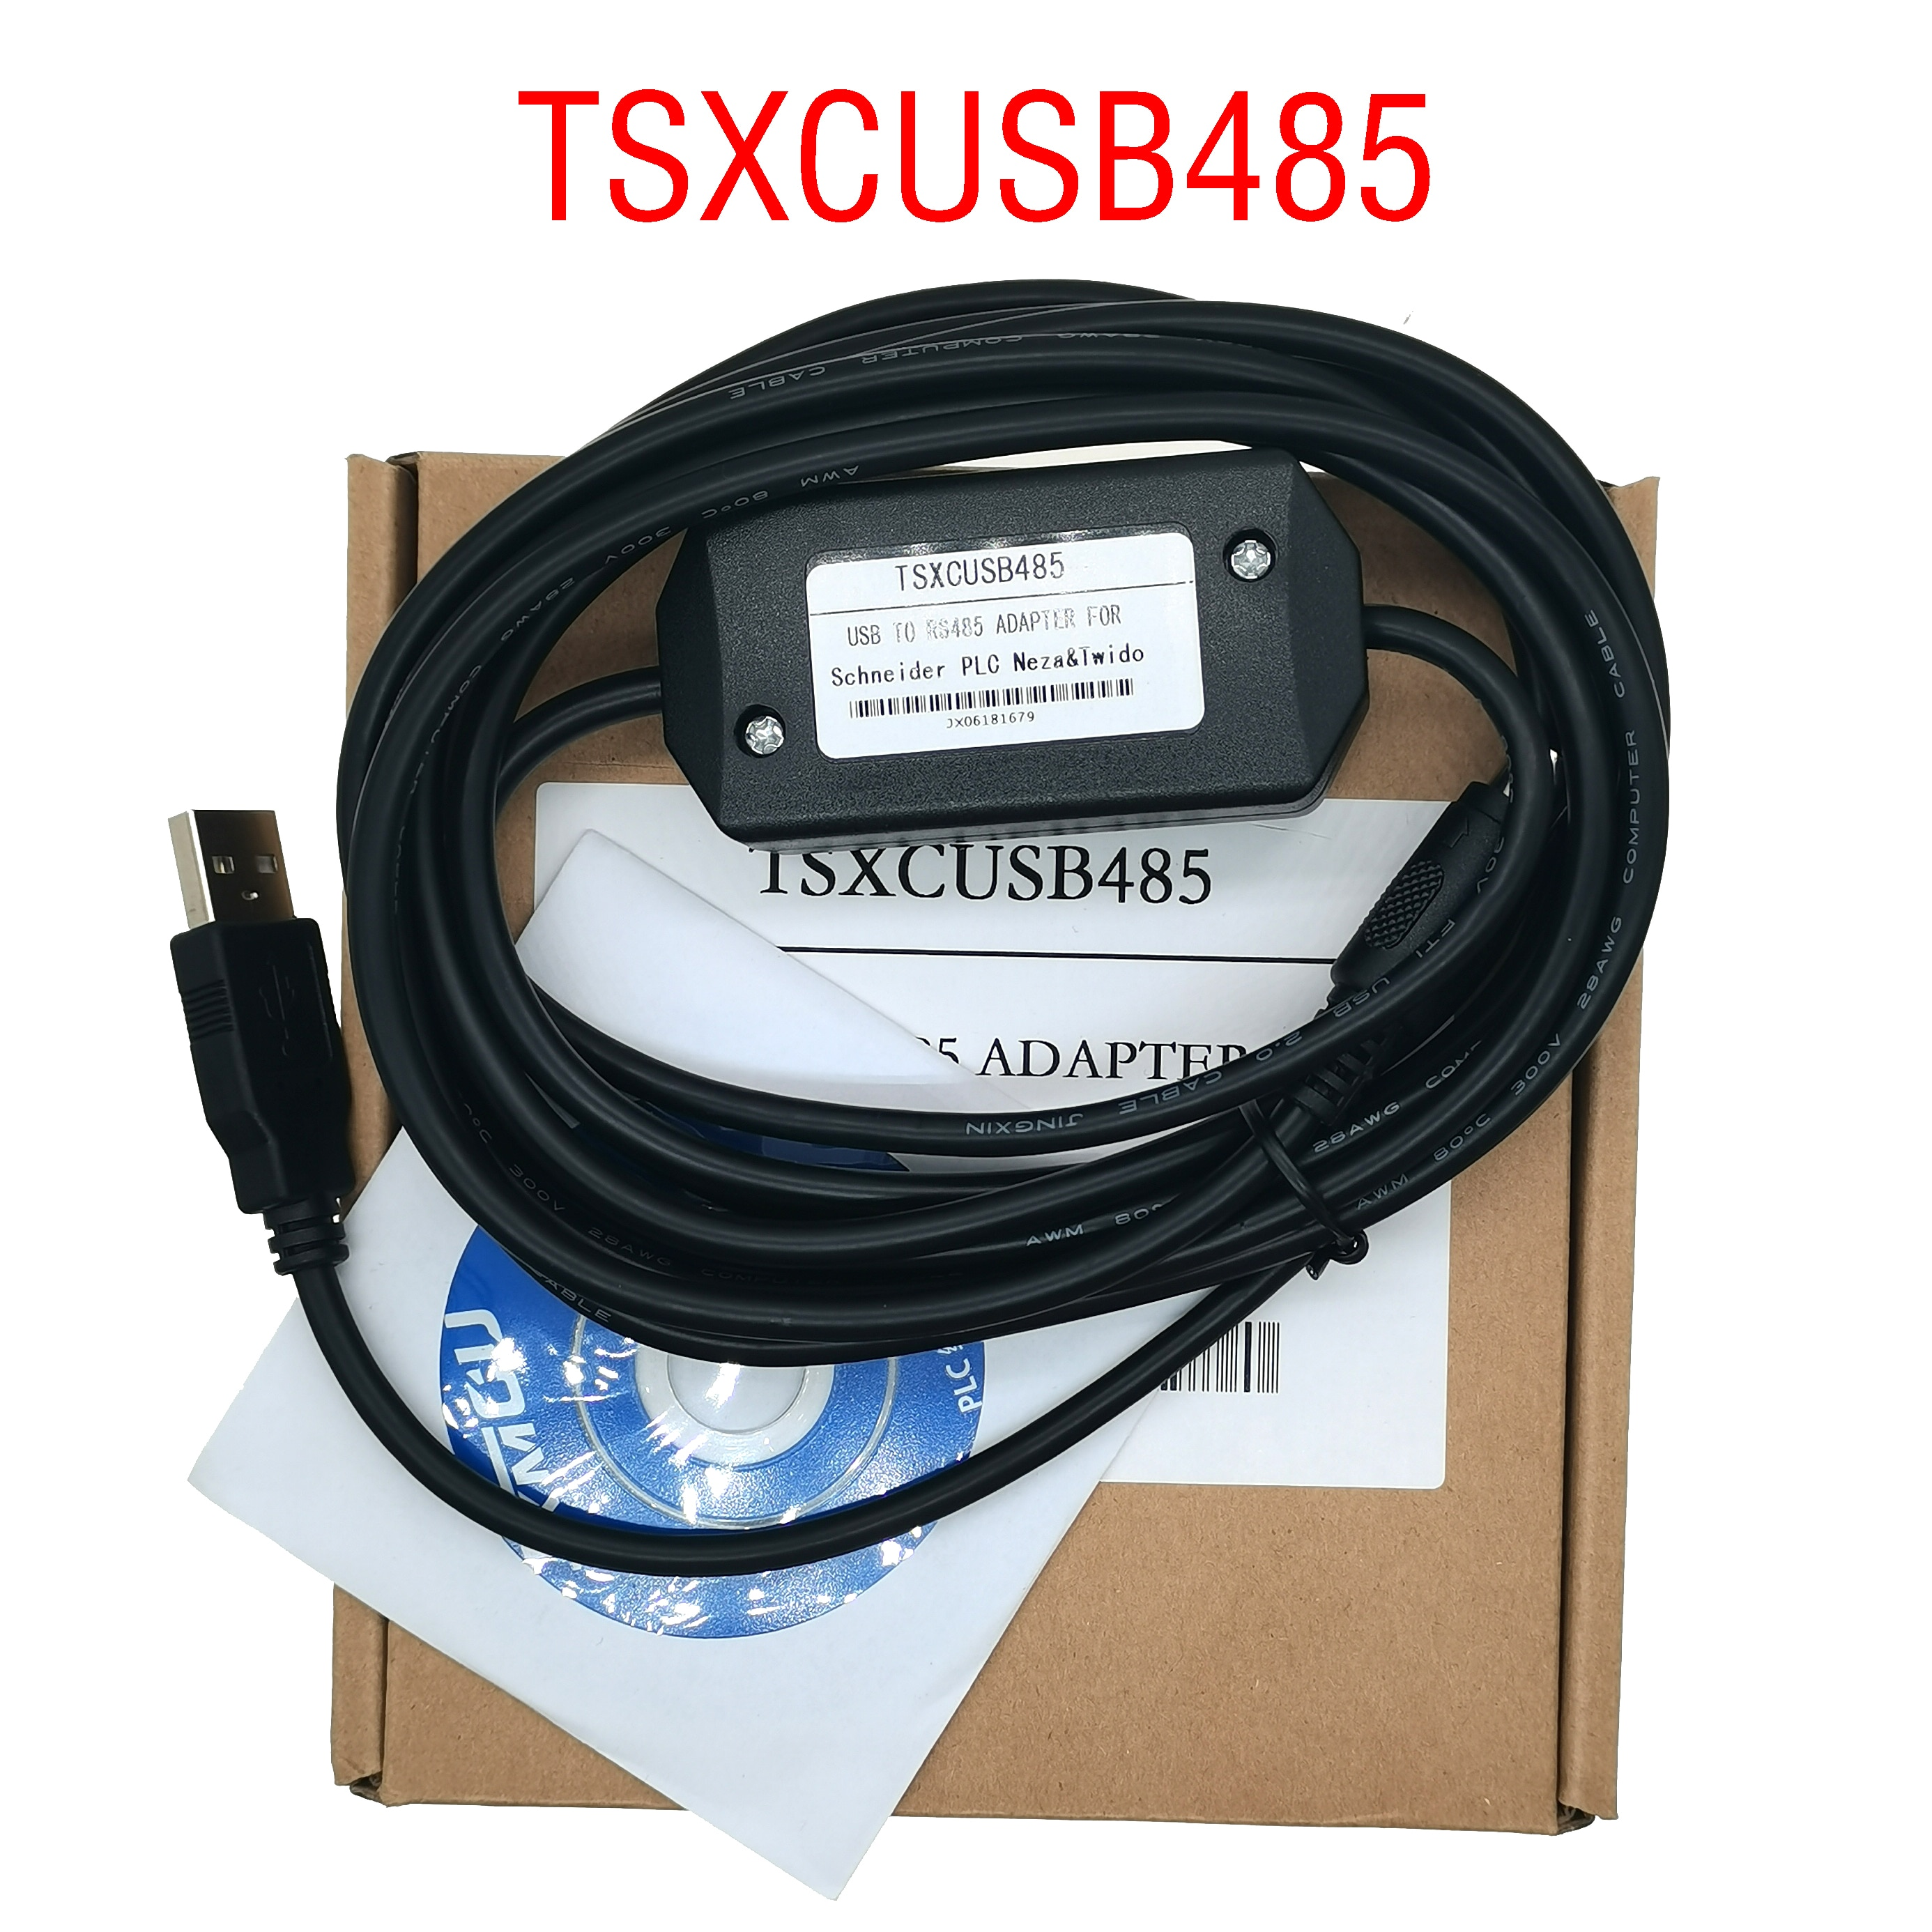 TSXCUSB485 + tsxcrjmd25 Repalce Tsxpcx3030 Usb/rs485 Adaptador Multifuncional Plc Para Premium Micro...